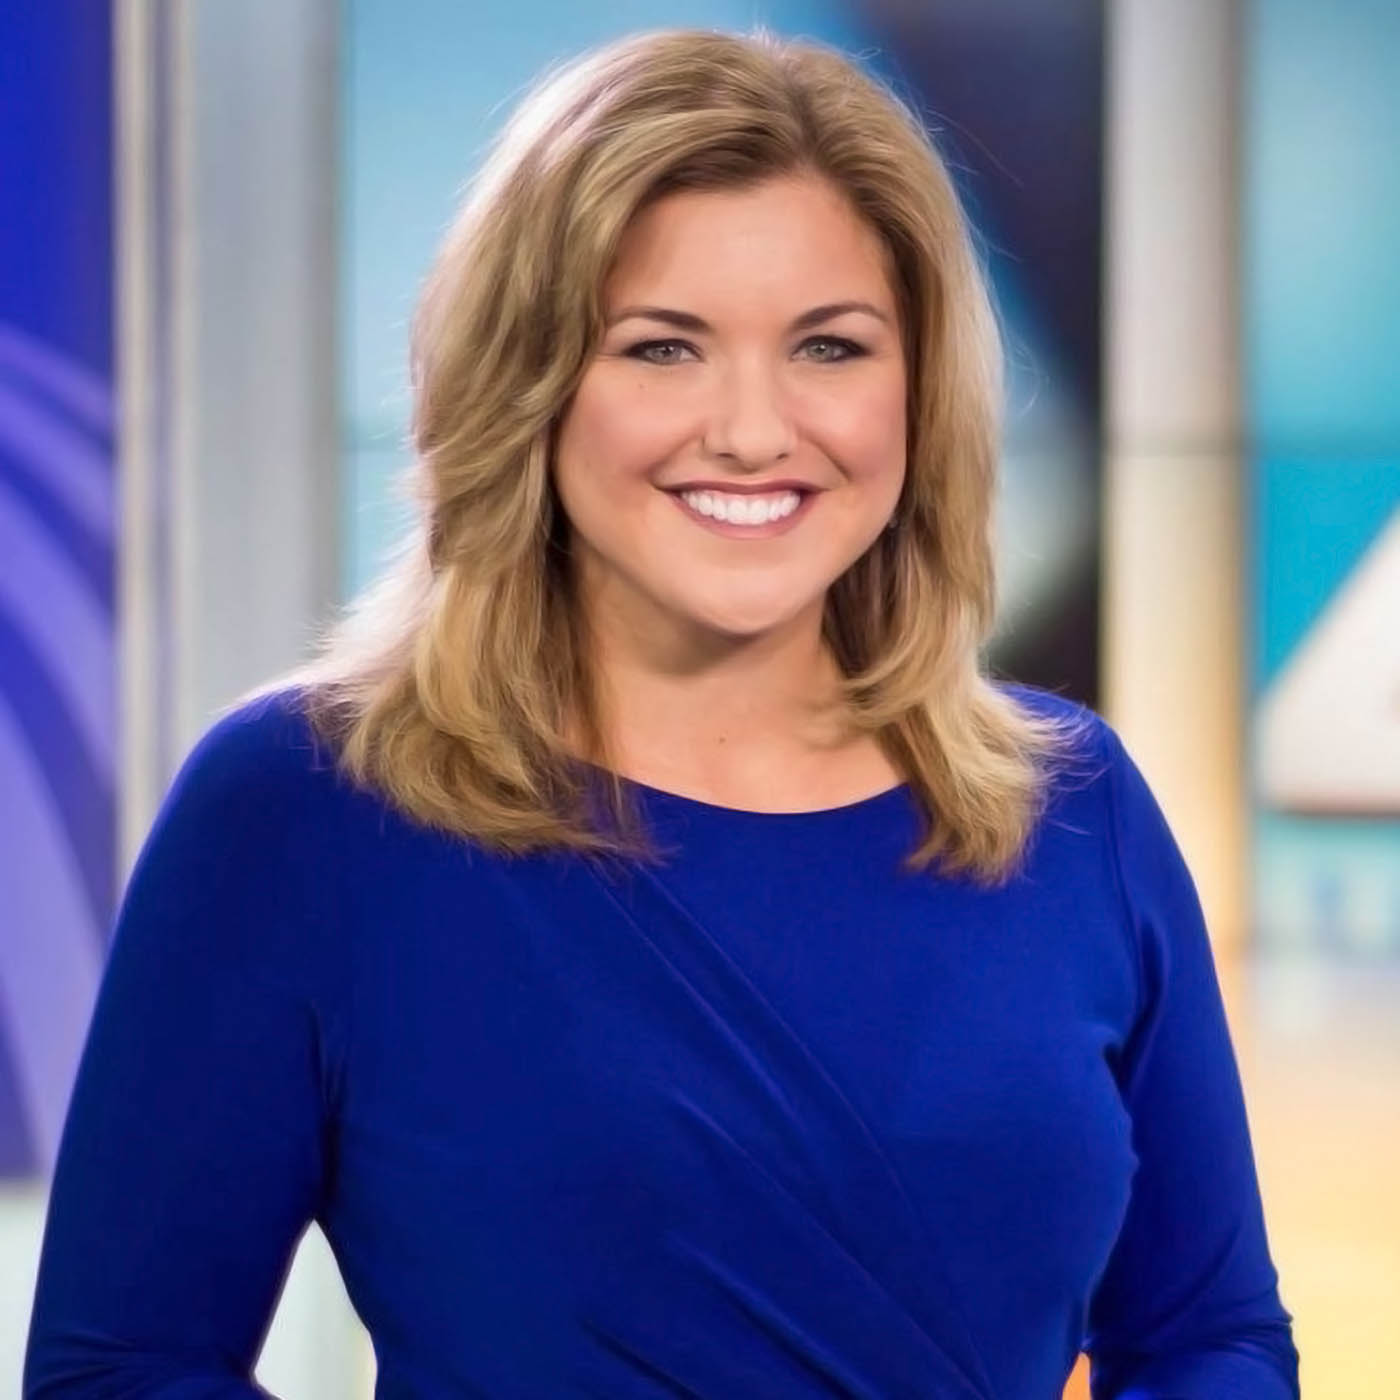 Alyssa Donovan services for WRTV News